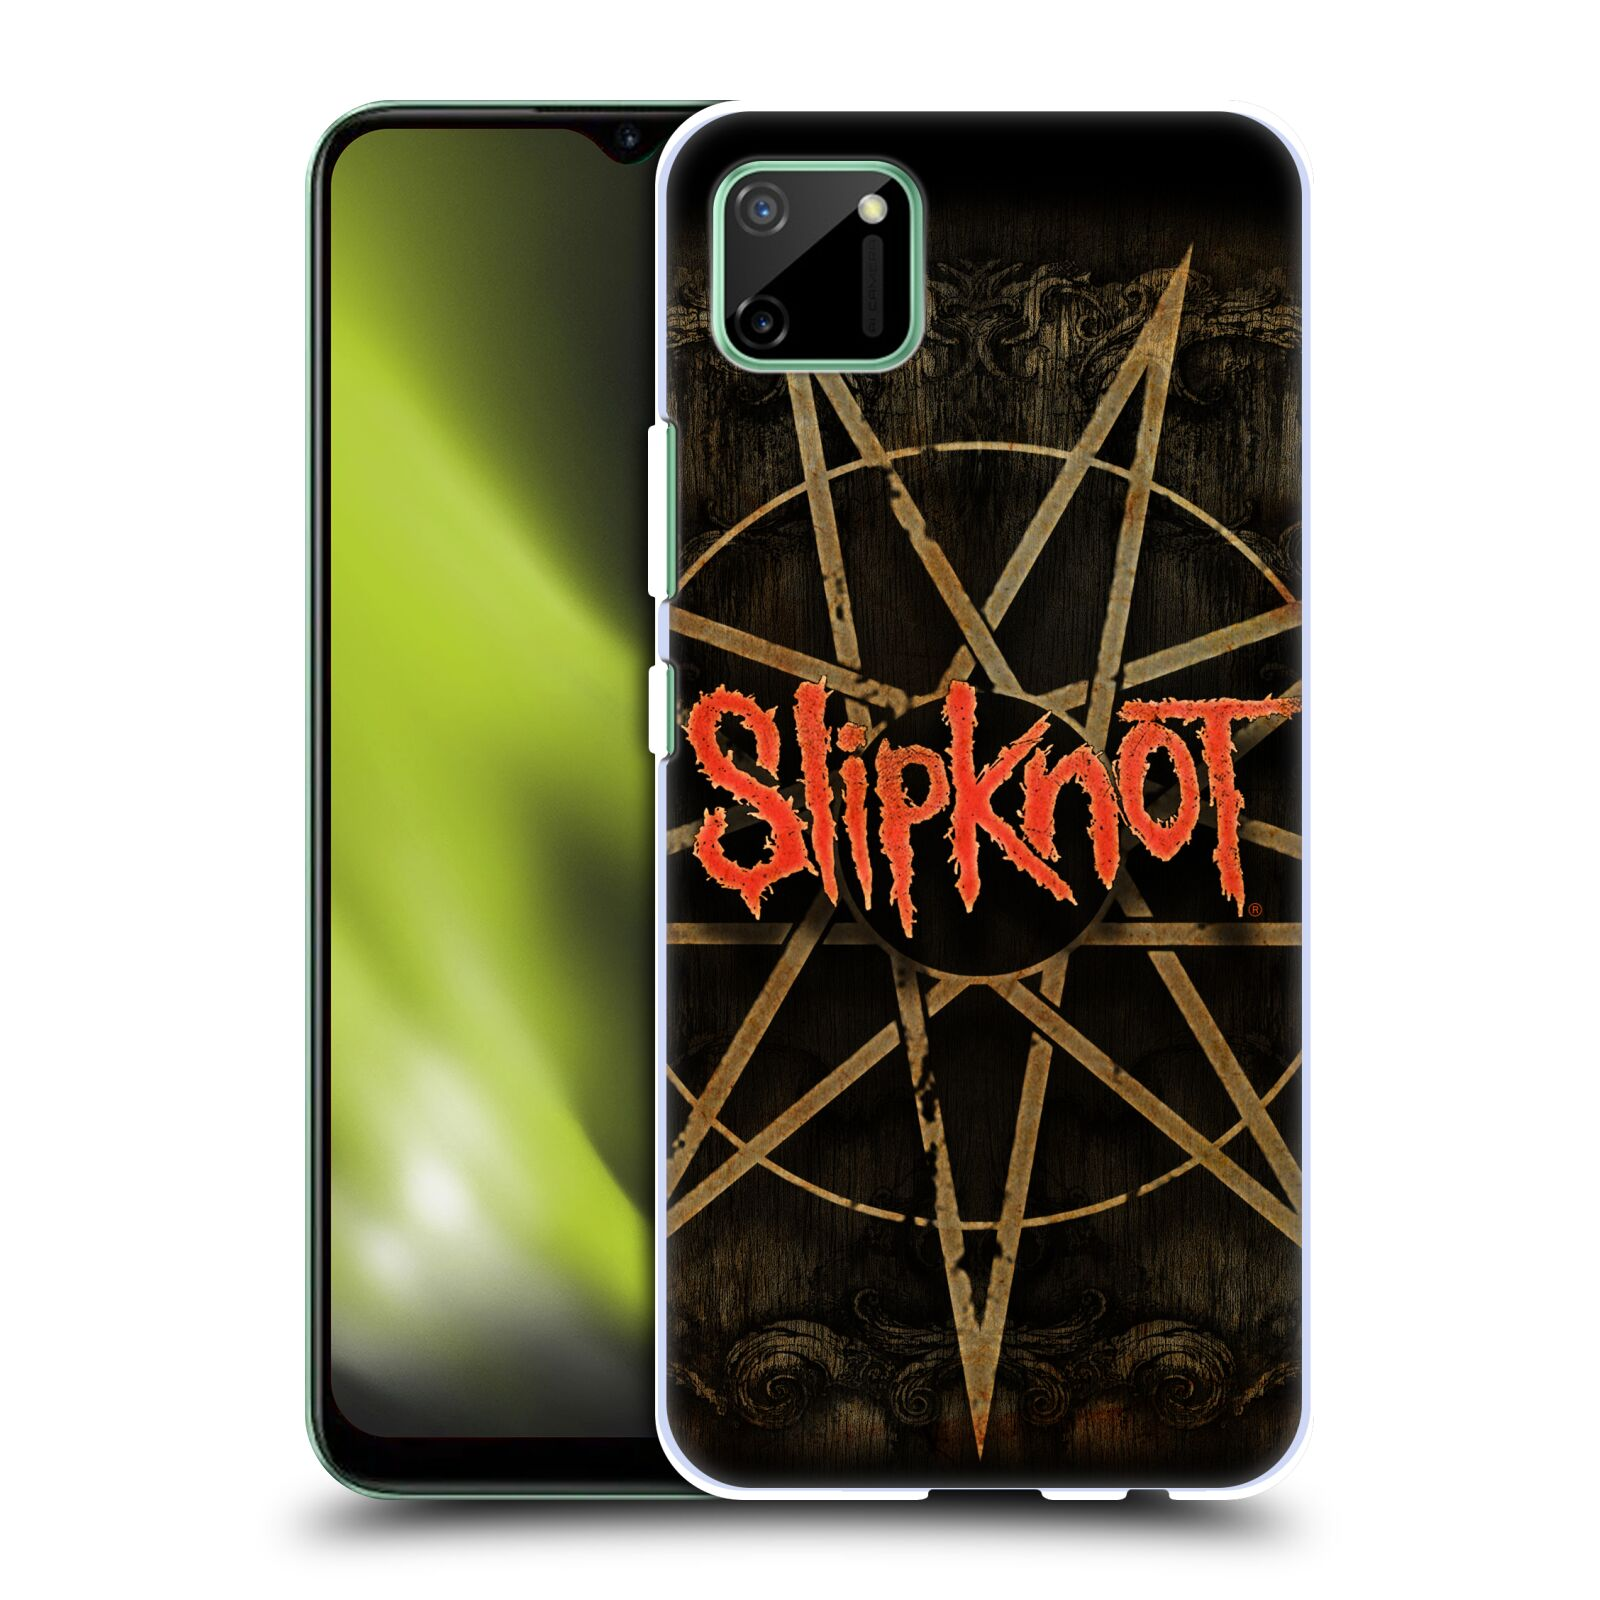 Plastové pouzdro na mobil Realme C11 - Head Case - Slipknot - Znak